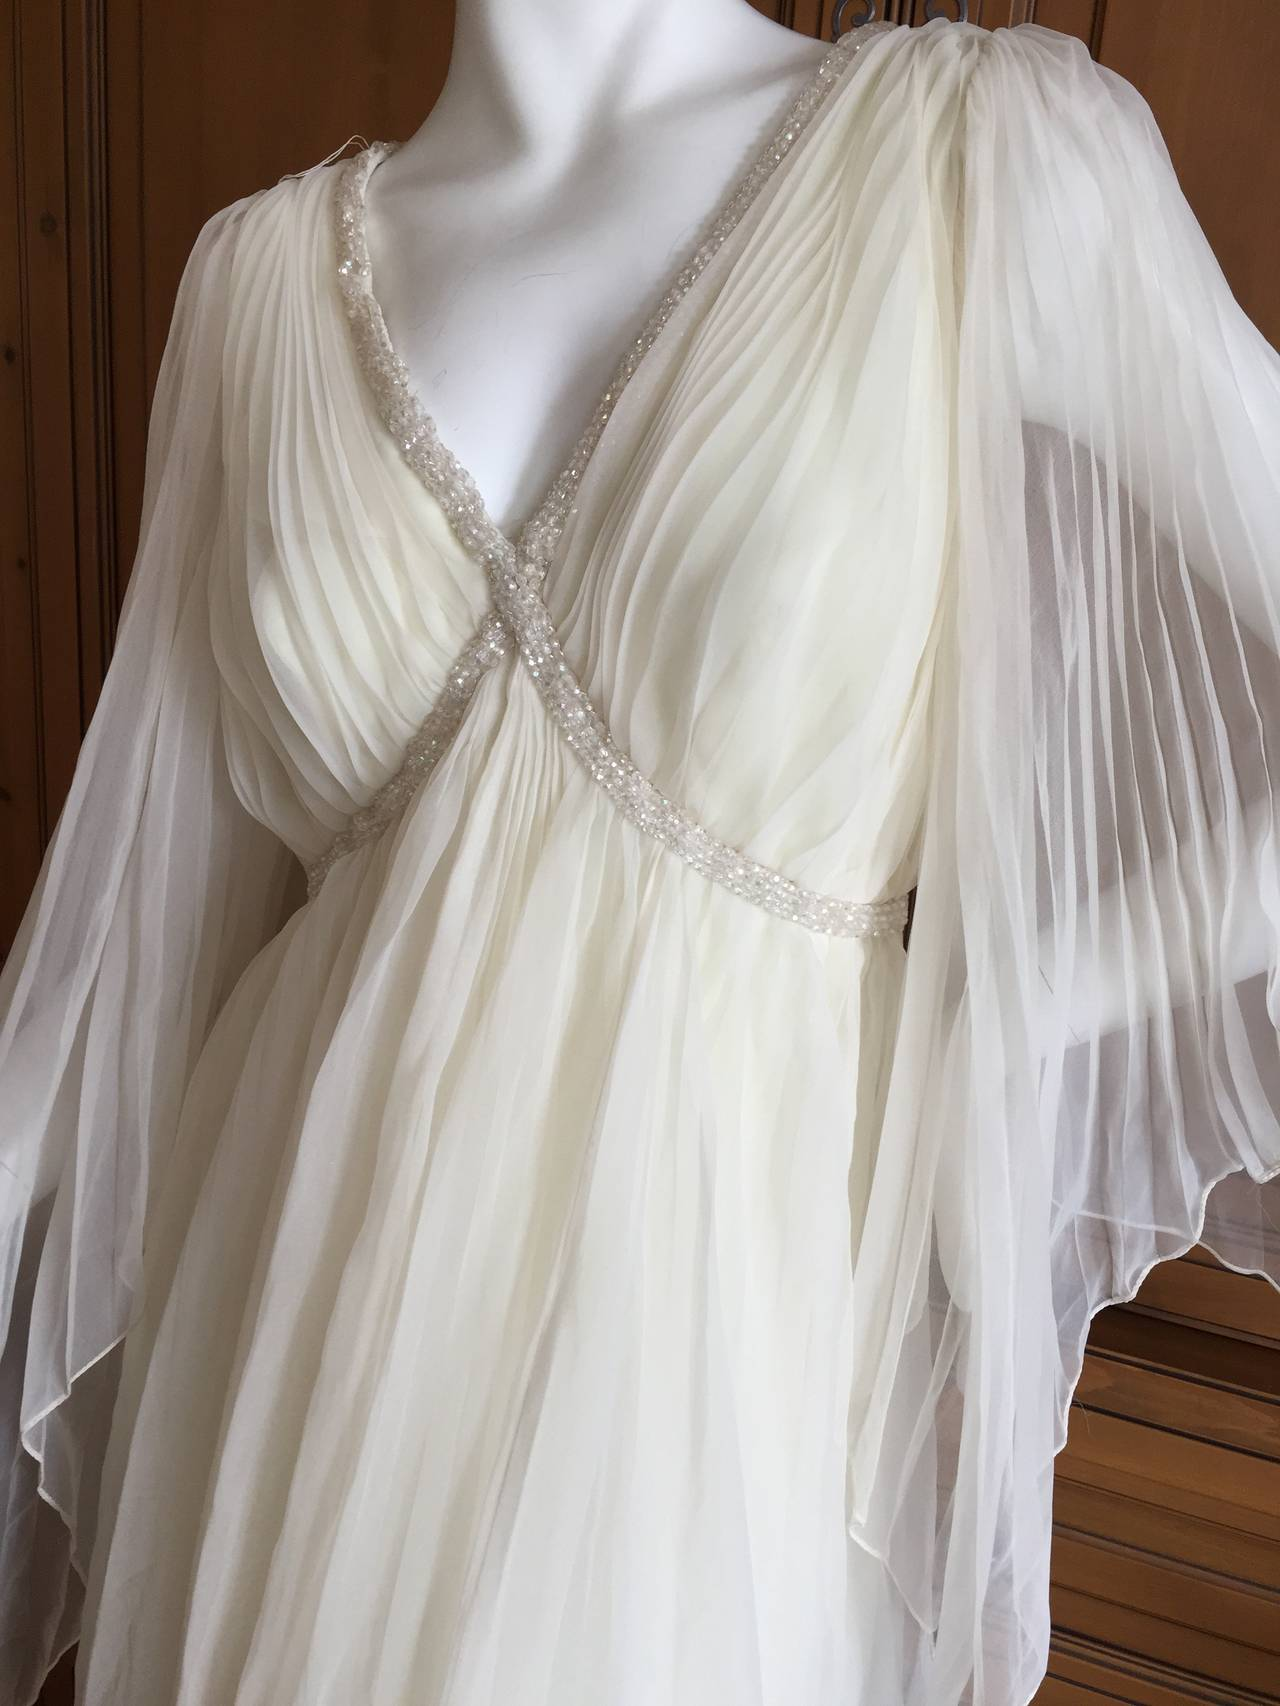 Jean Louis Romantic Ivory Beaded Dress 3